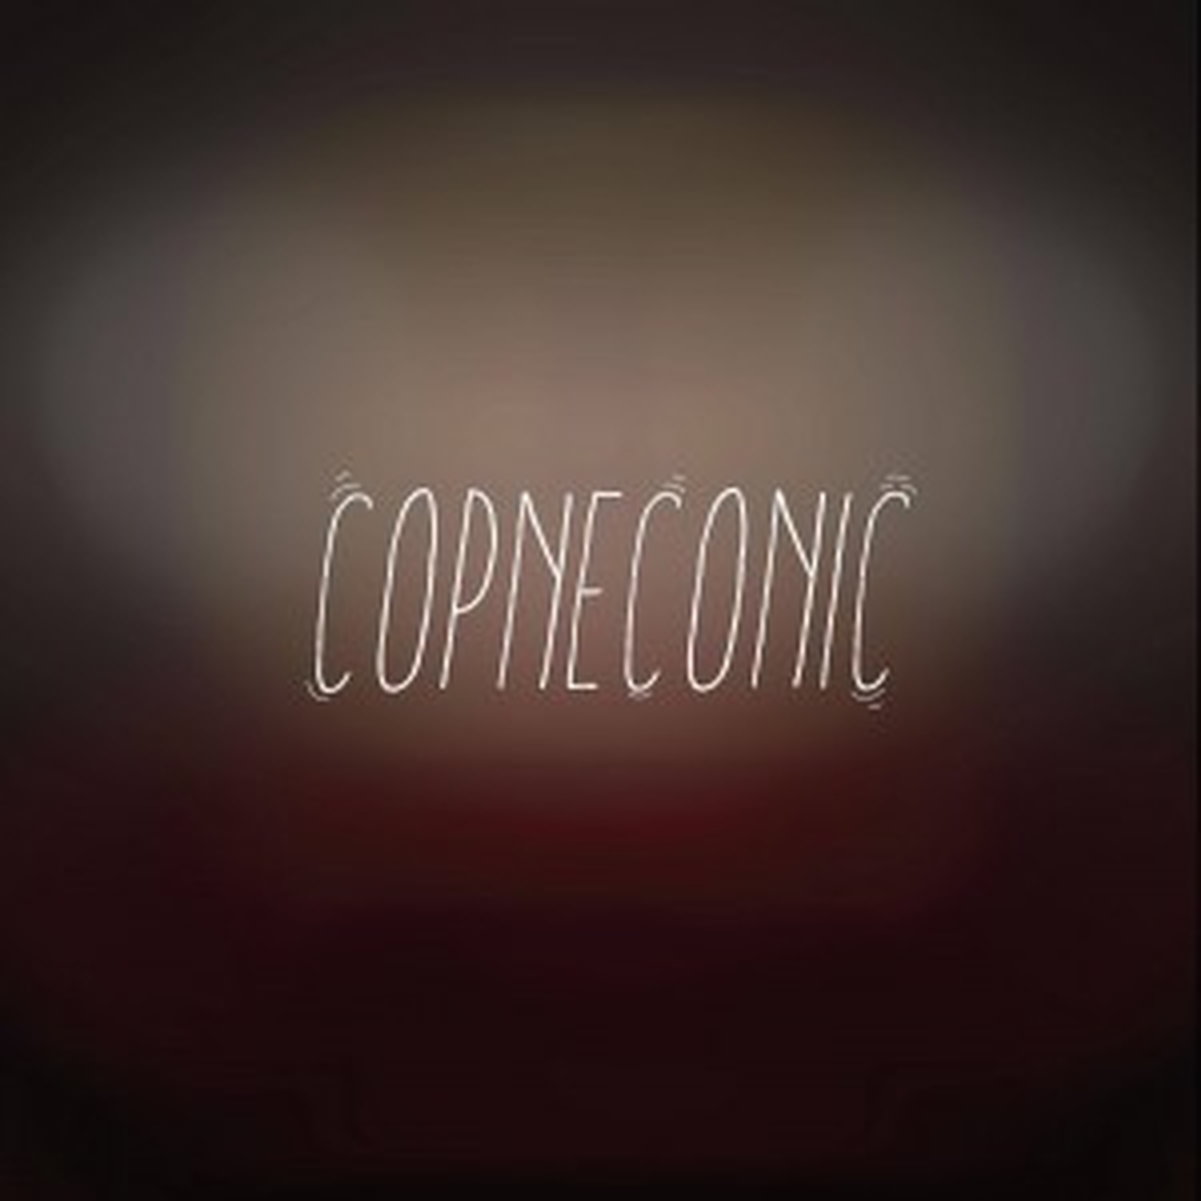 Copneconic wiki, Copneconic review, Copneconic history, Copneconic news